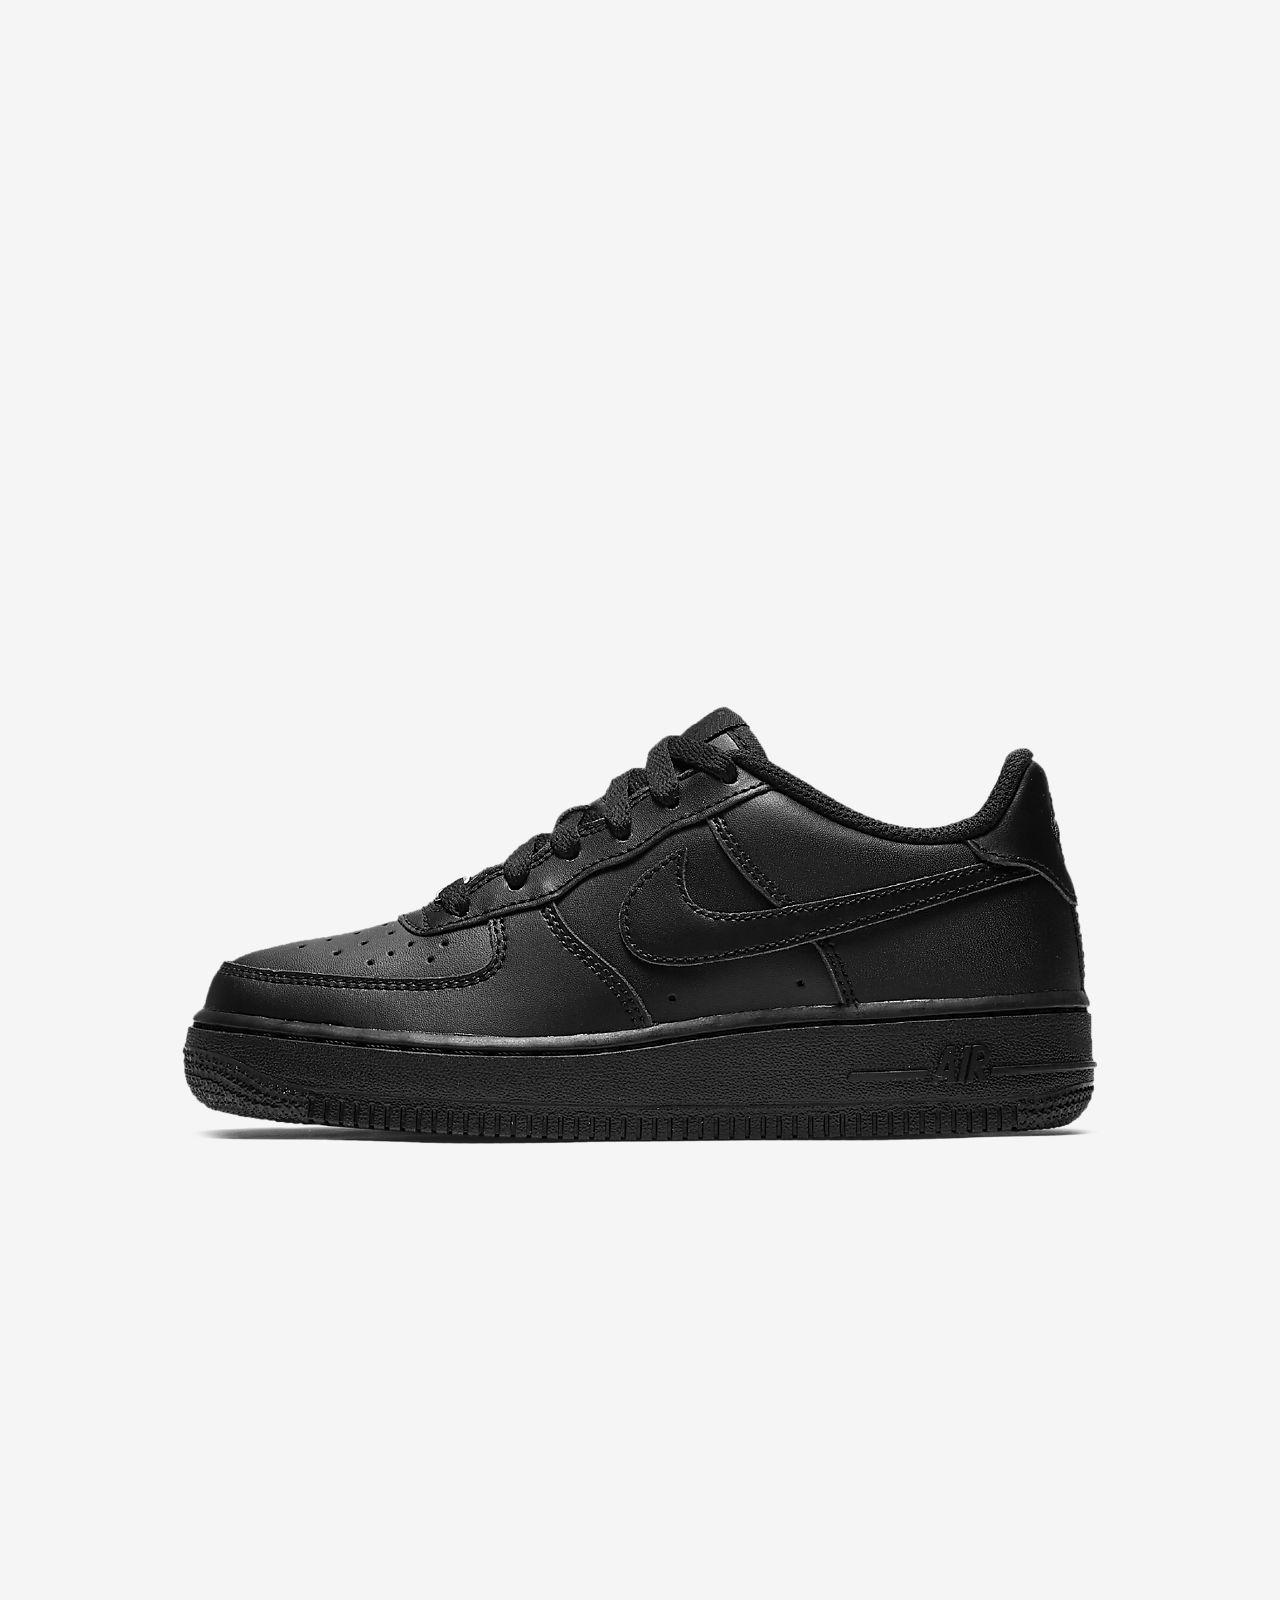 Nike Air Force 1 Triple Black Schuh für ältere Kinder